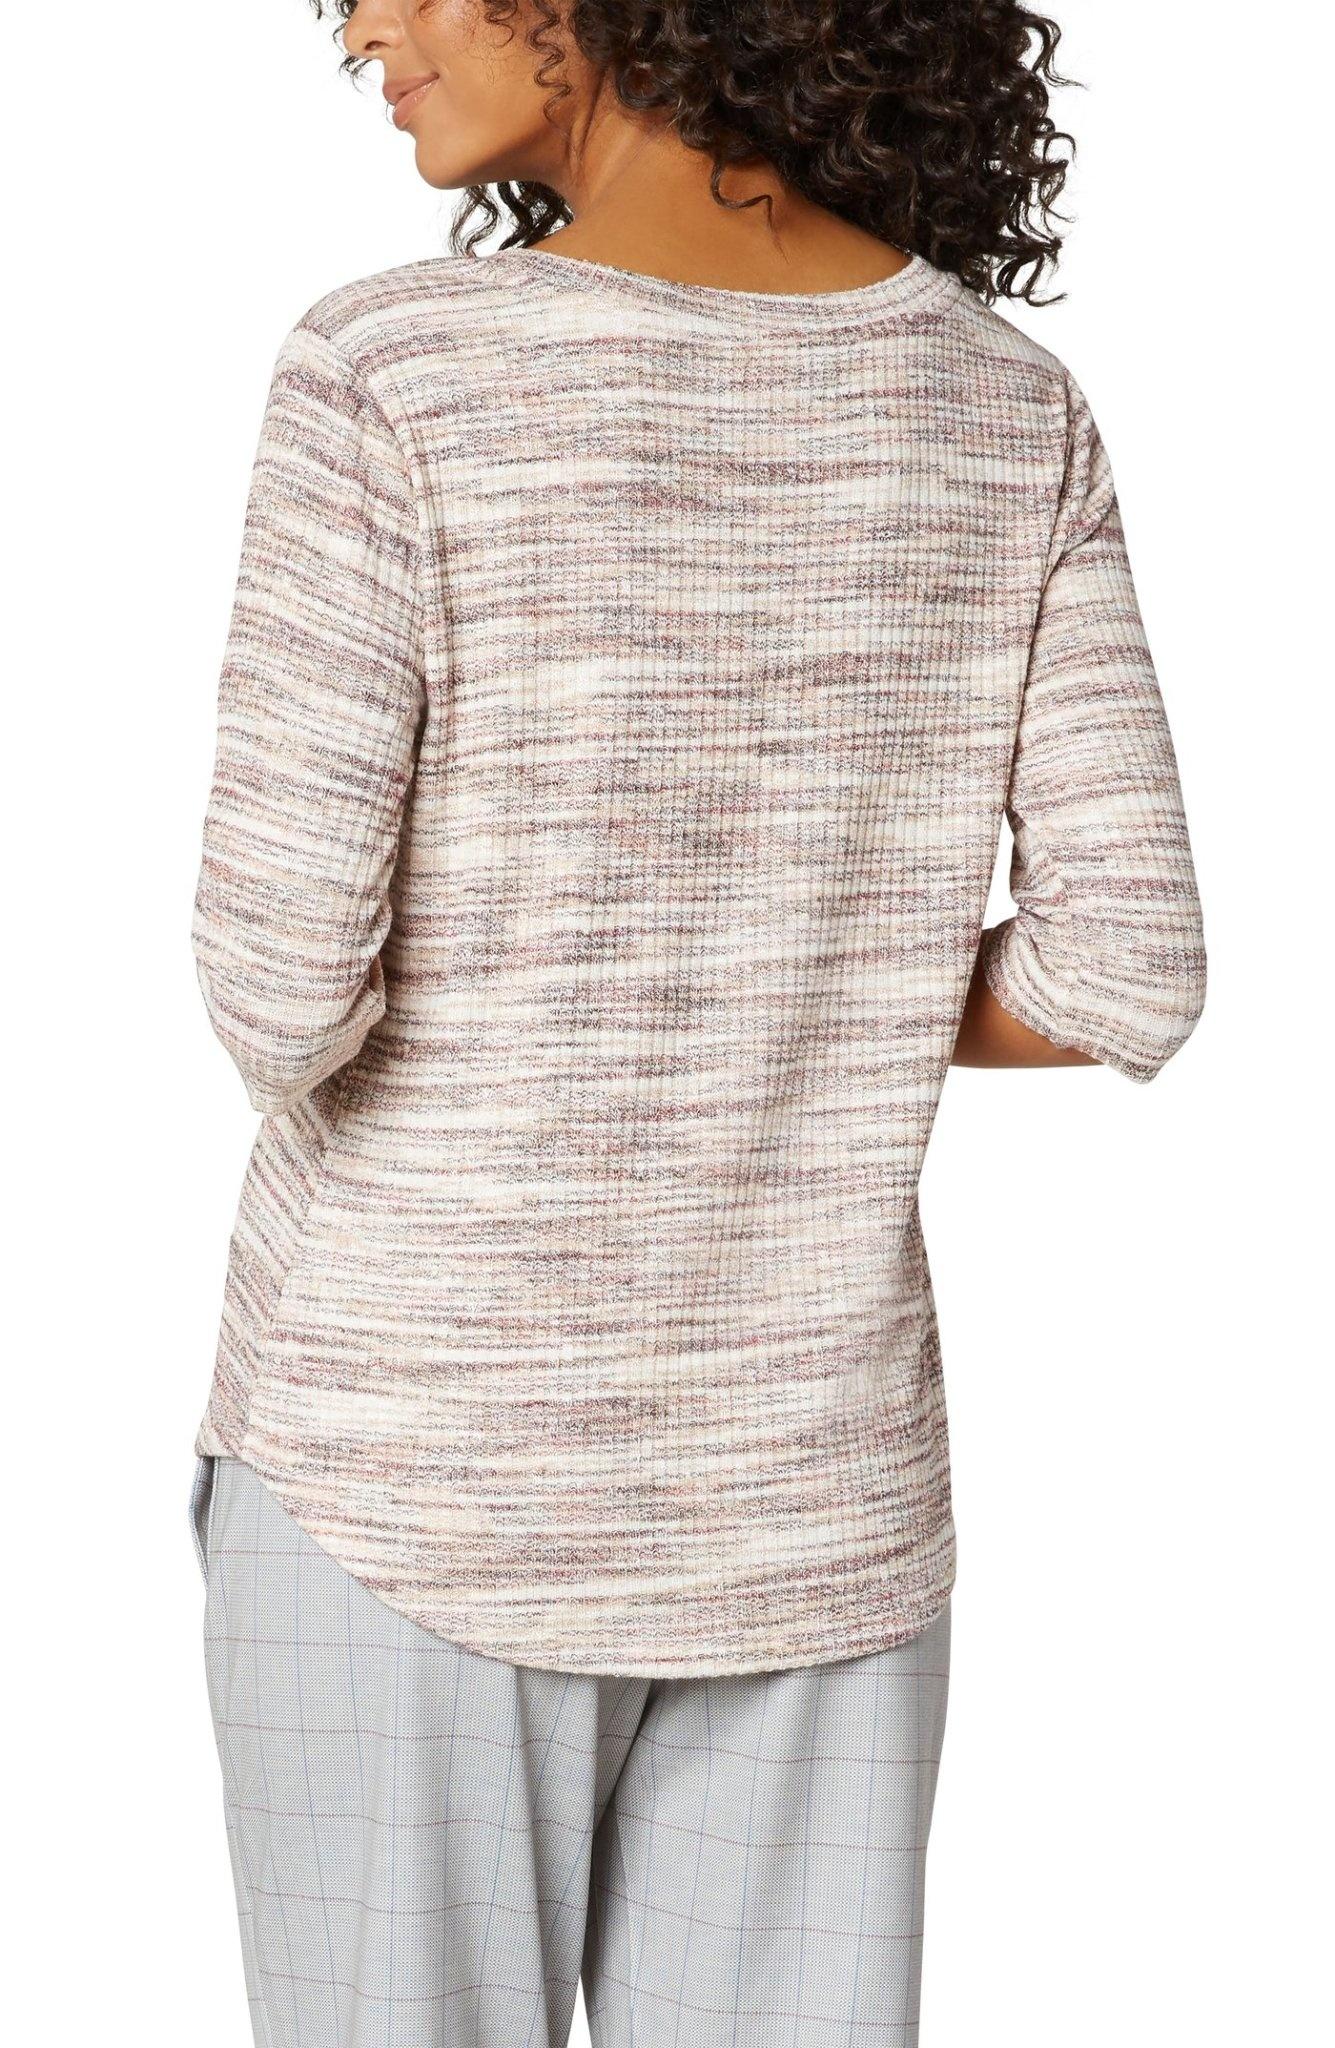 Elbow Sleeve Knit Tee